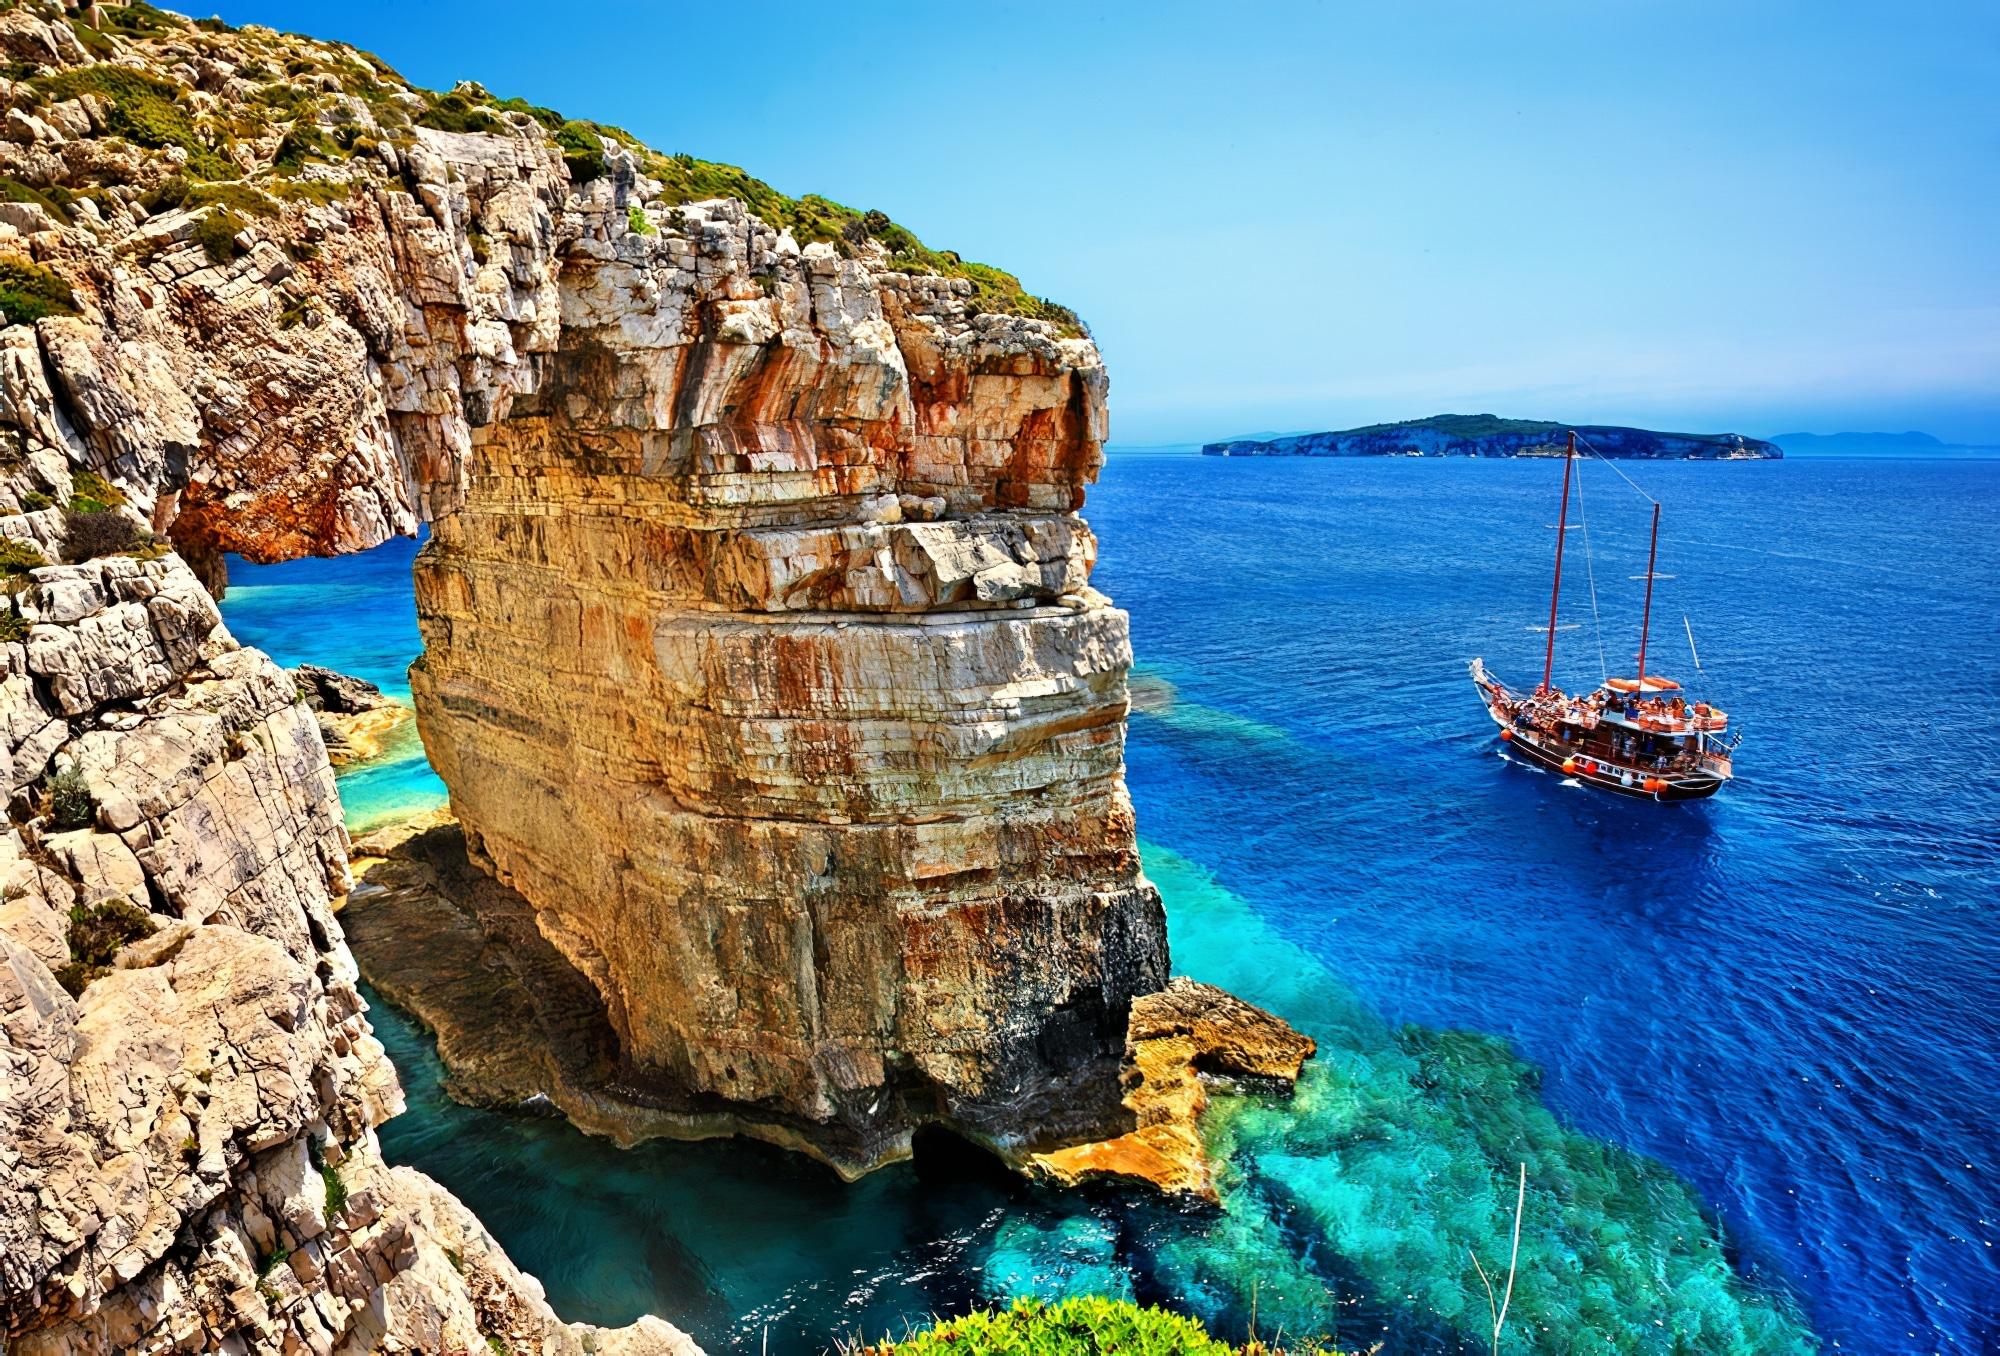 Îles de Paxos et Antipaxos